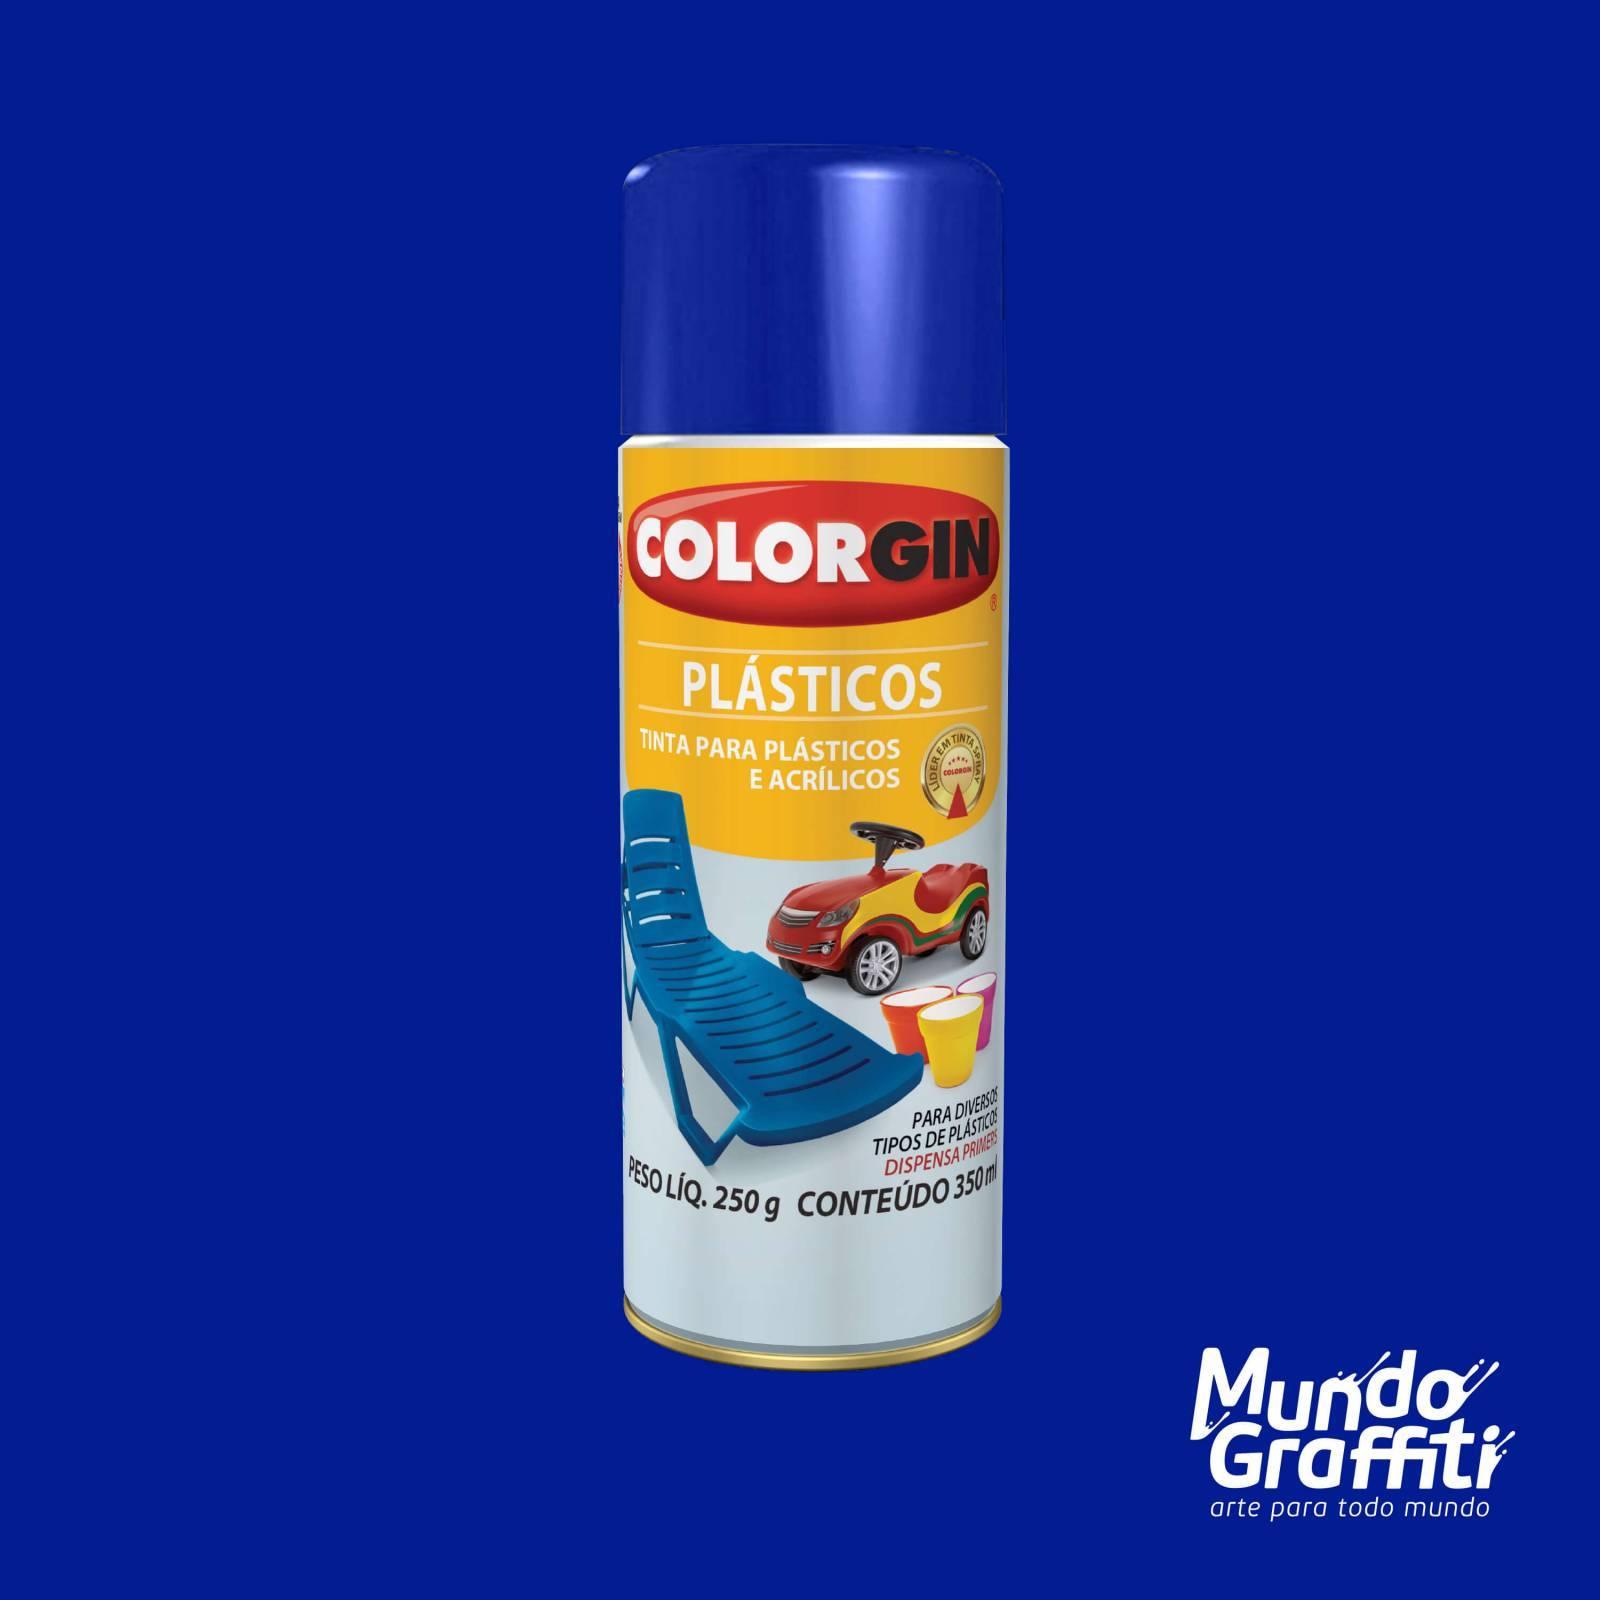 Tinta Spray Colorgin p/ Plasticos 1507 Azul Oceano 350ml - Mundo Graffiti